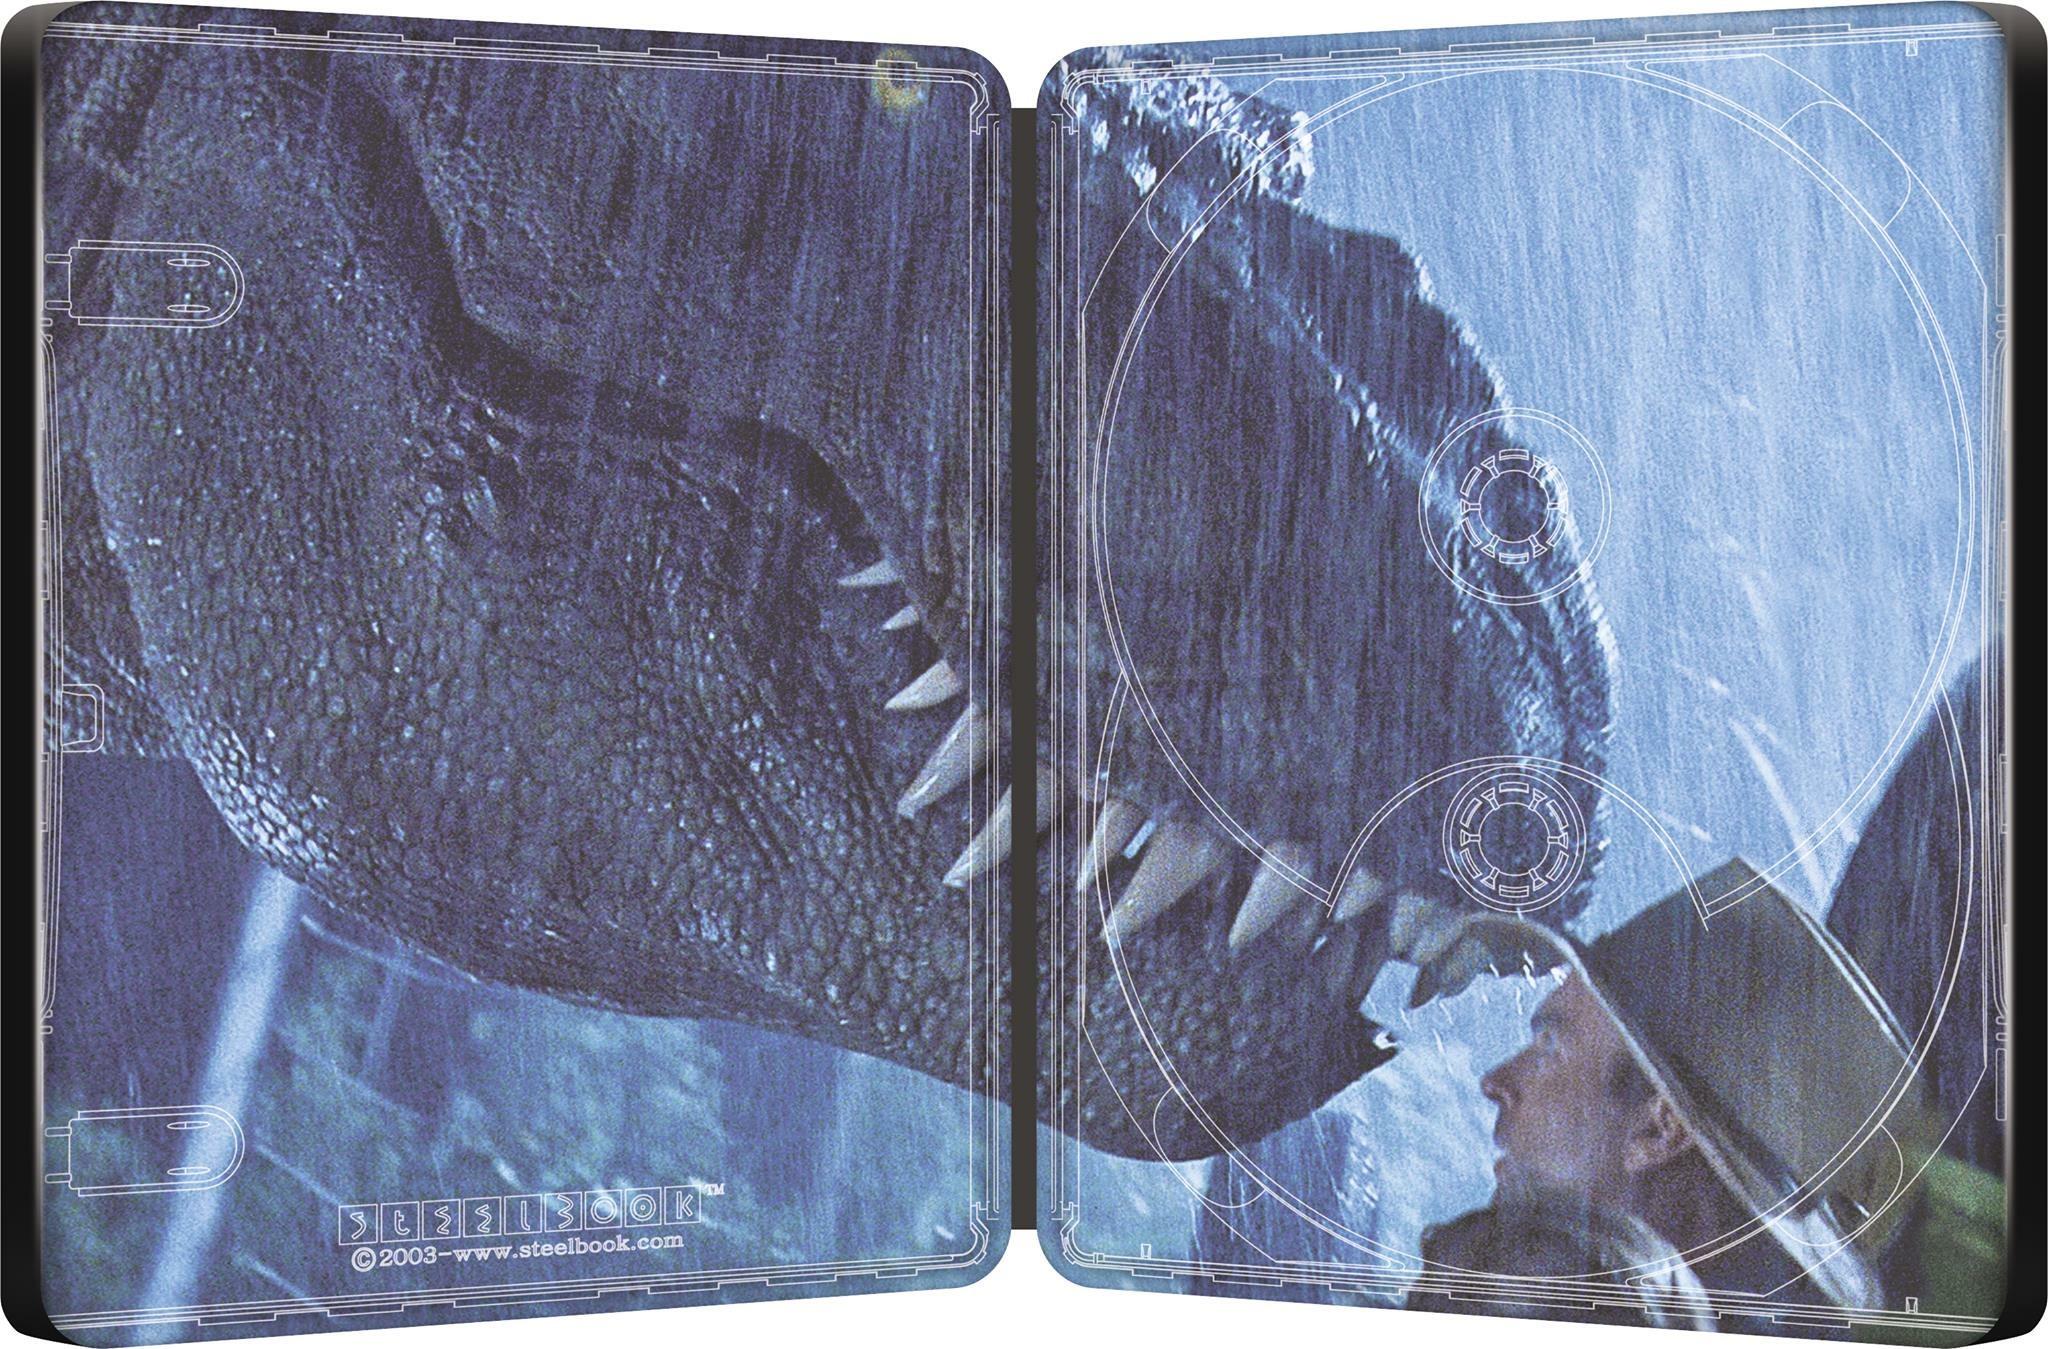 Jurassic Park steelbook 2